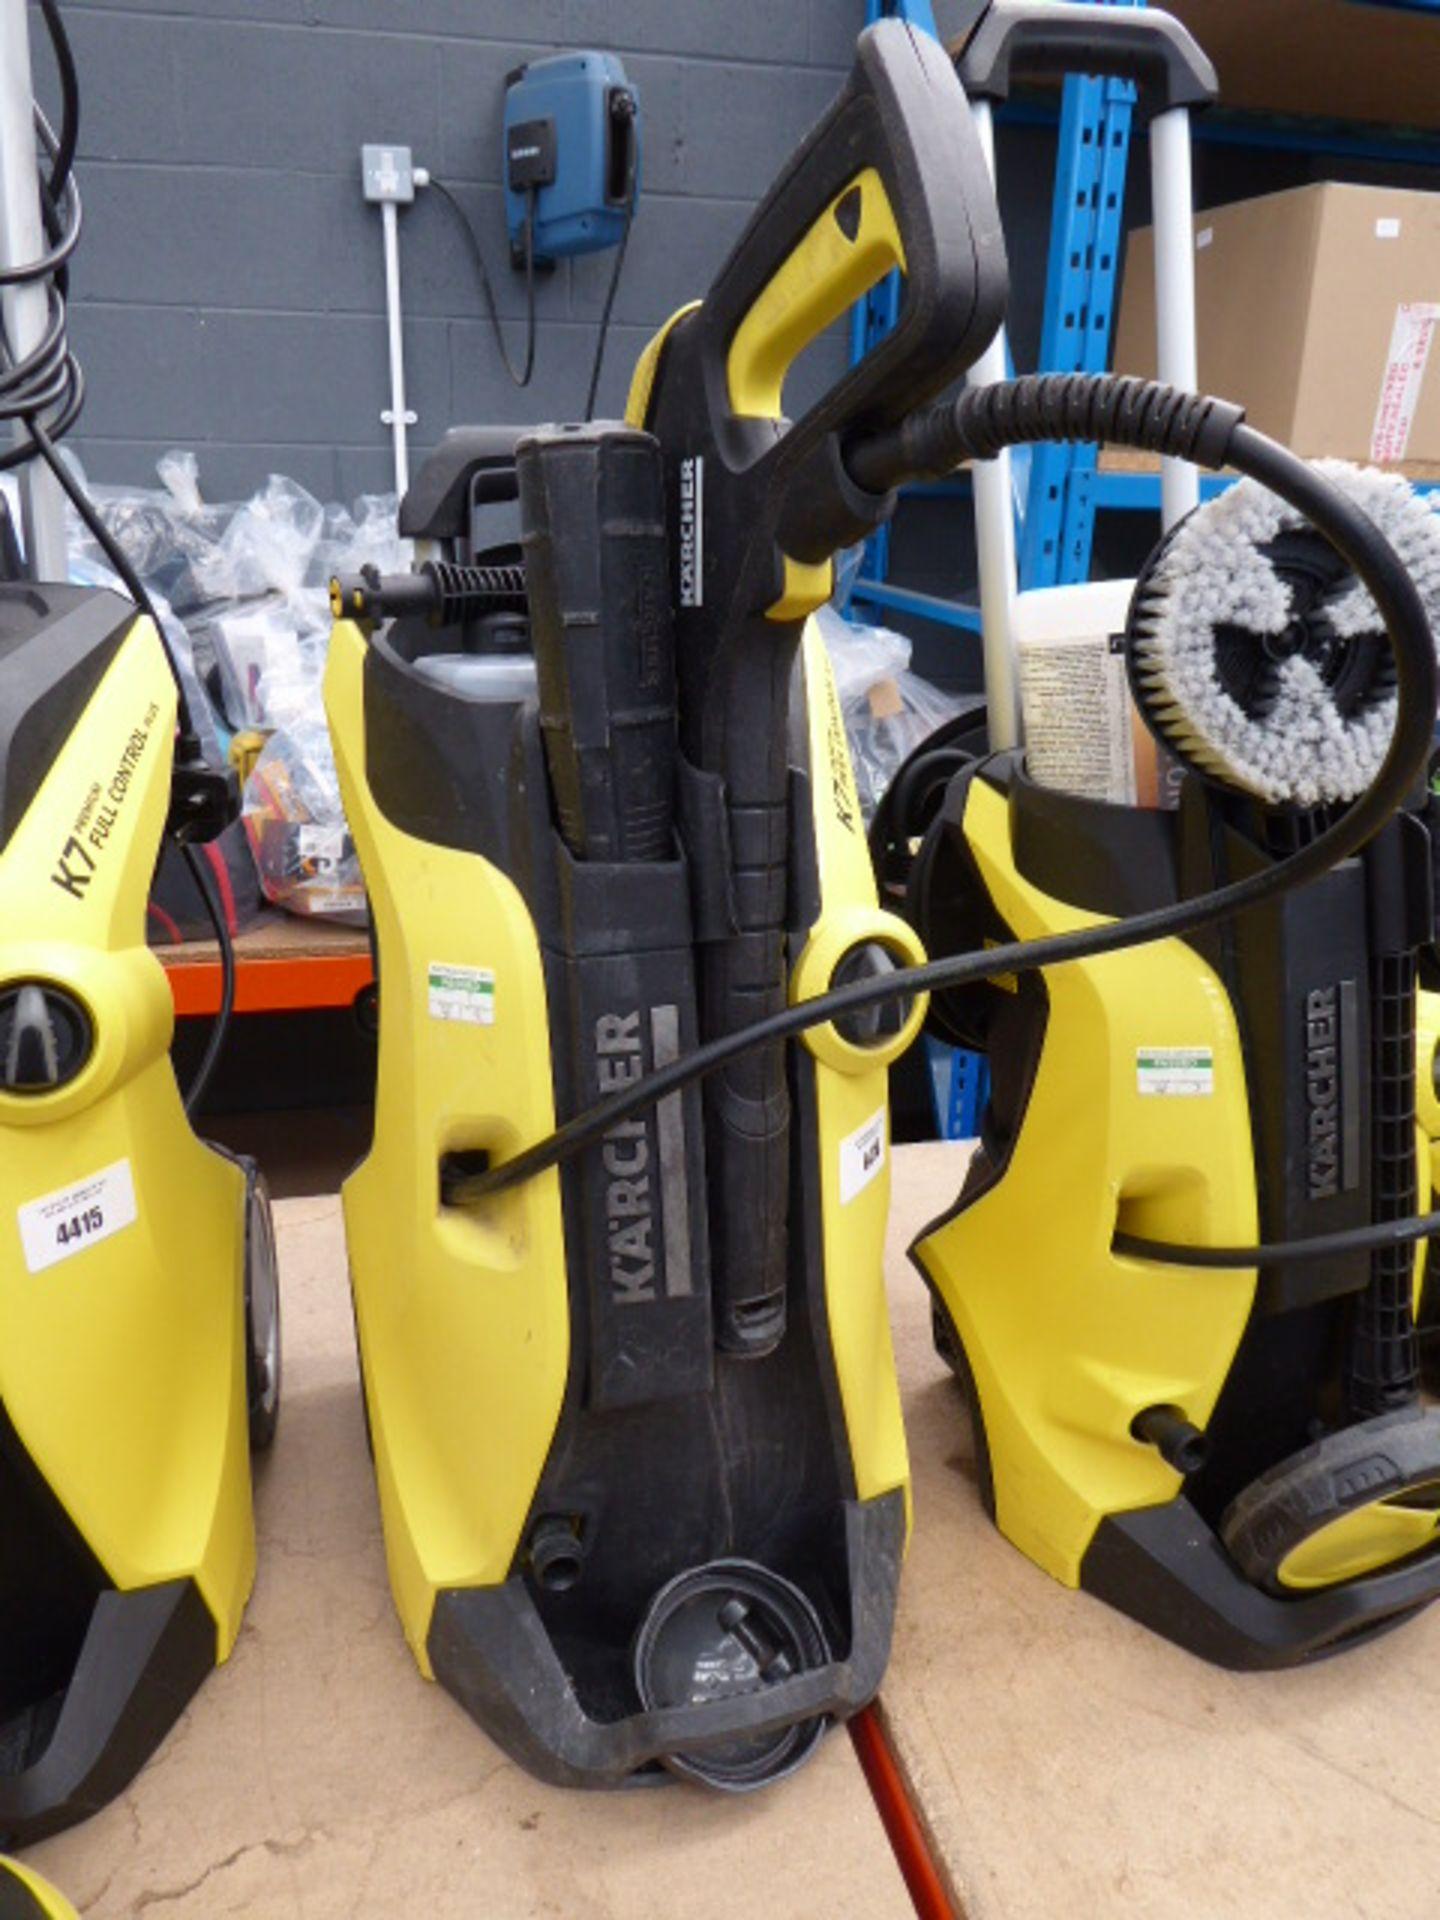 Lot 4414 - Karcher K7 premium full control electric pressure washer